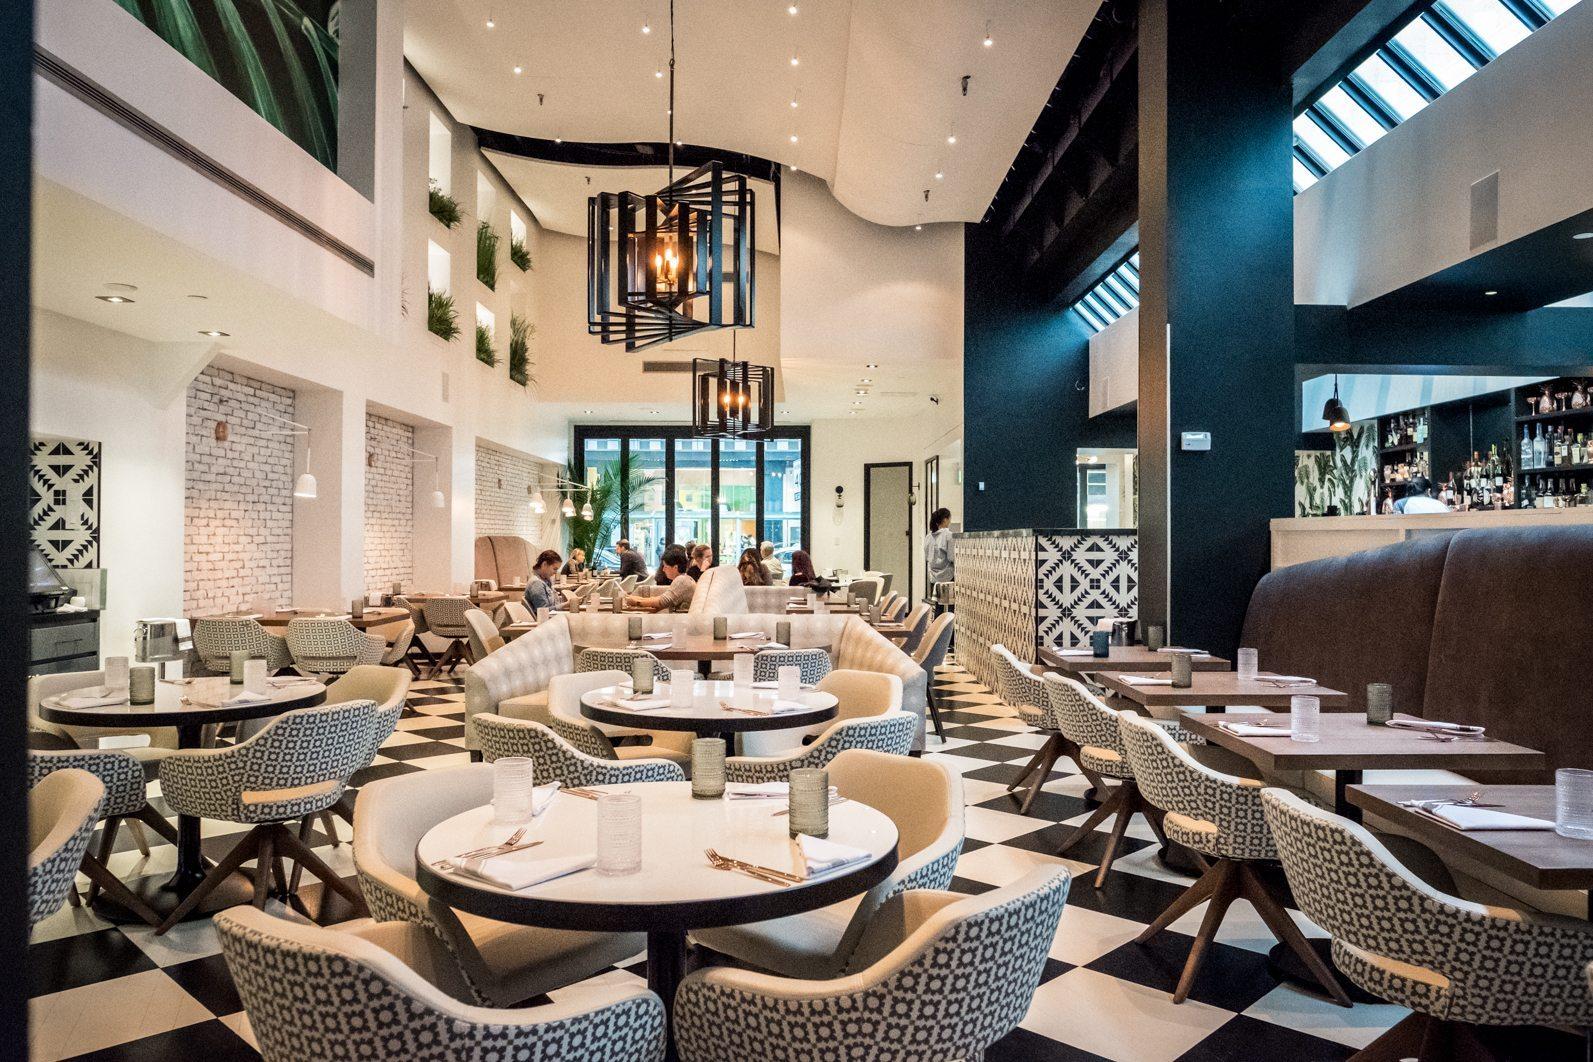 toronto-restaurants-planta-vegetarian-the-chase-david-lee-yorkville-room-1